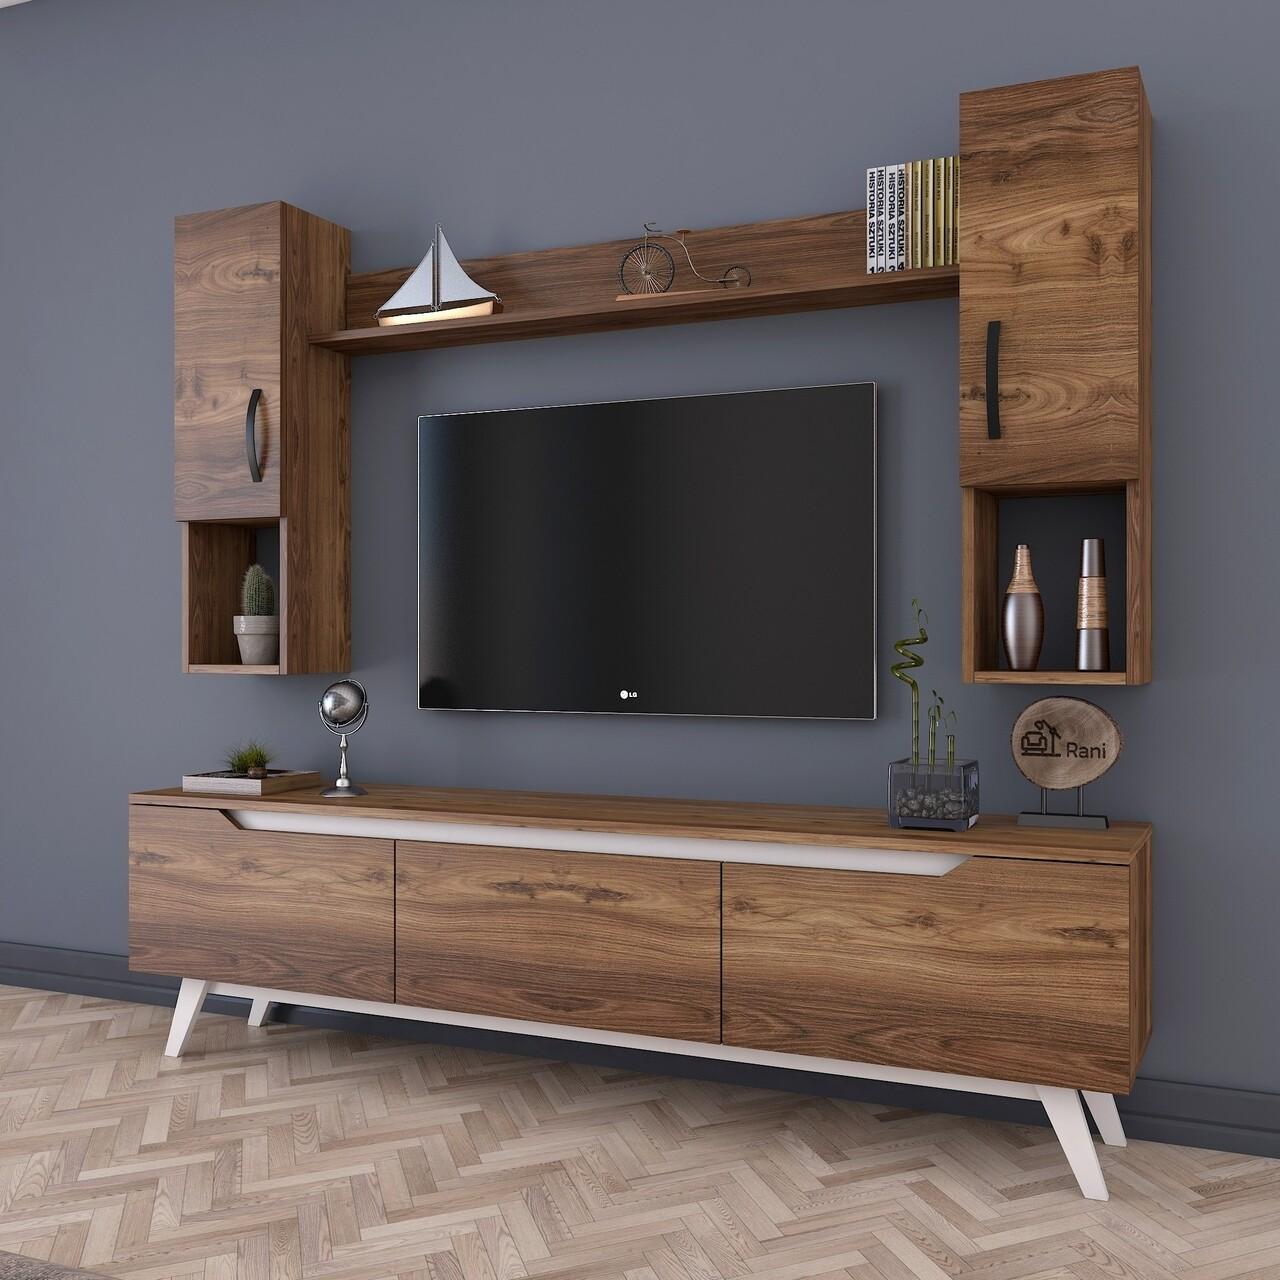 Comoda TV cu raft de perete si 2 cabinete M27 - 833, Wren, 180 x 35 x 48.6 cm/133 cm, walnut/white